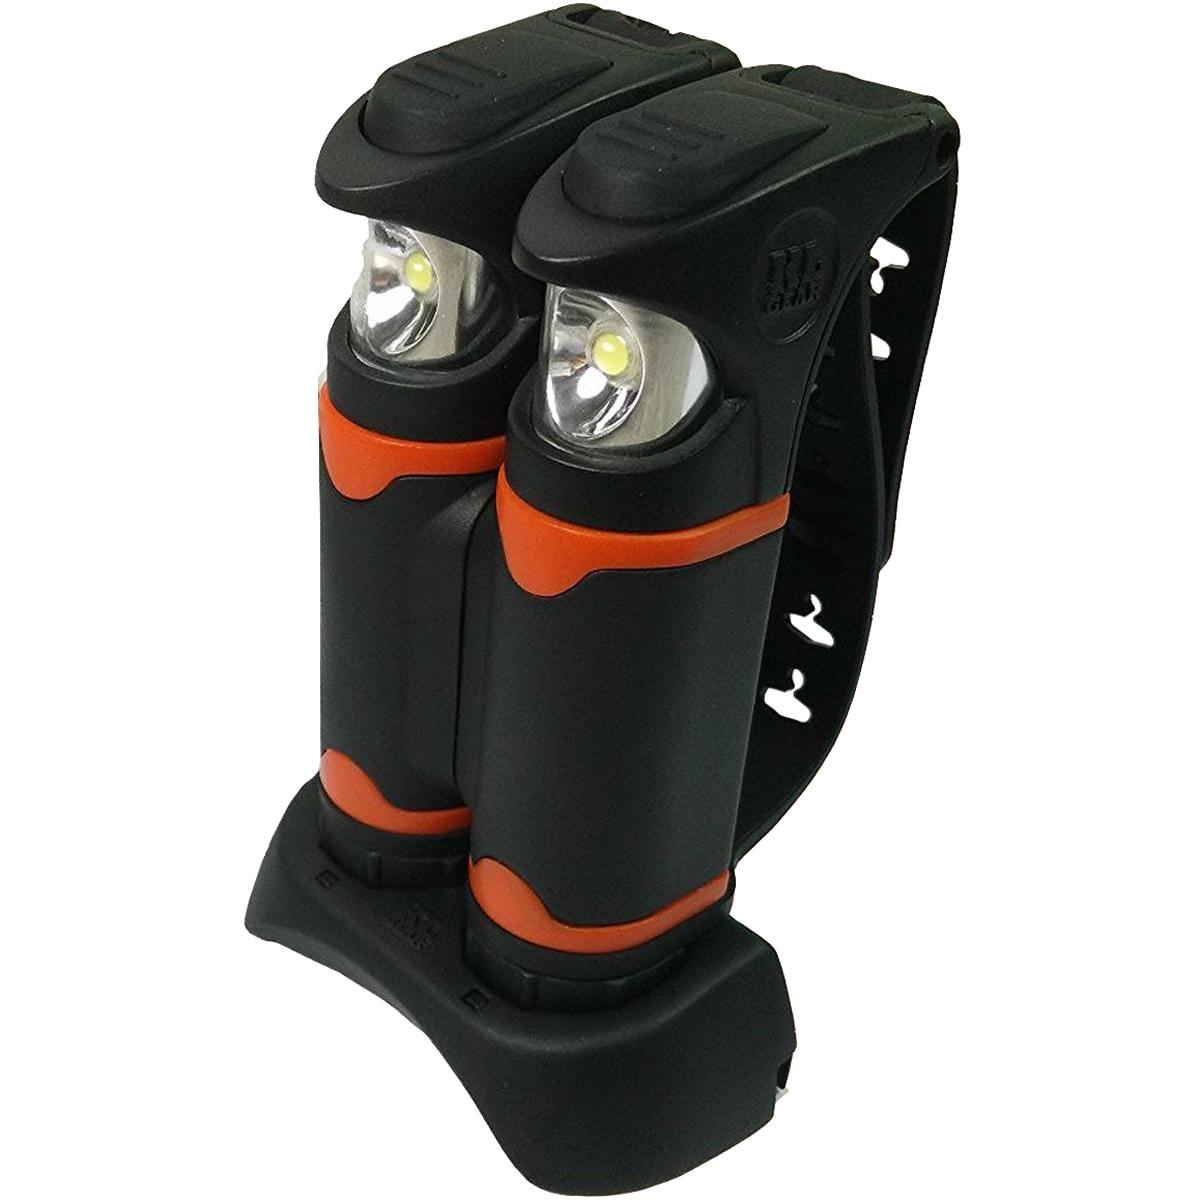 Knuckle Lights Rechargeable Handheld LED Running Safety Light Set